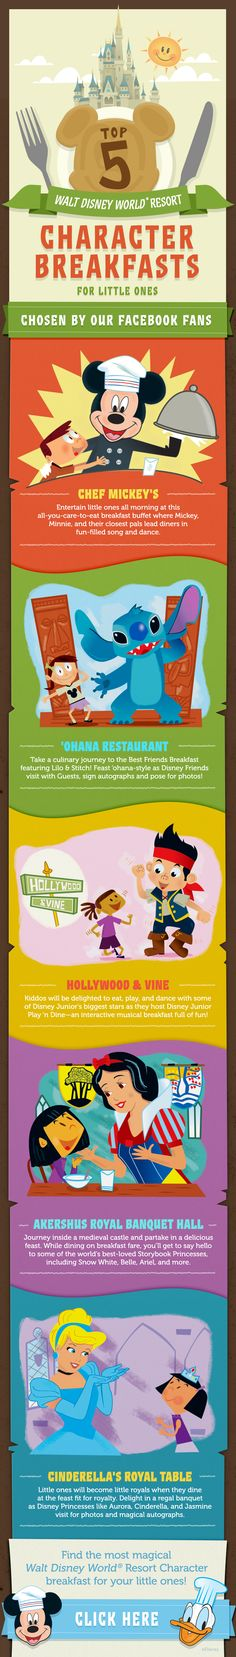 Top 5 Character Breakfasts for little ones at Walt Disney World! #vacation #tips #tricks #DisneyKids